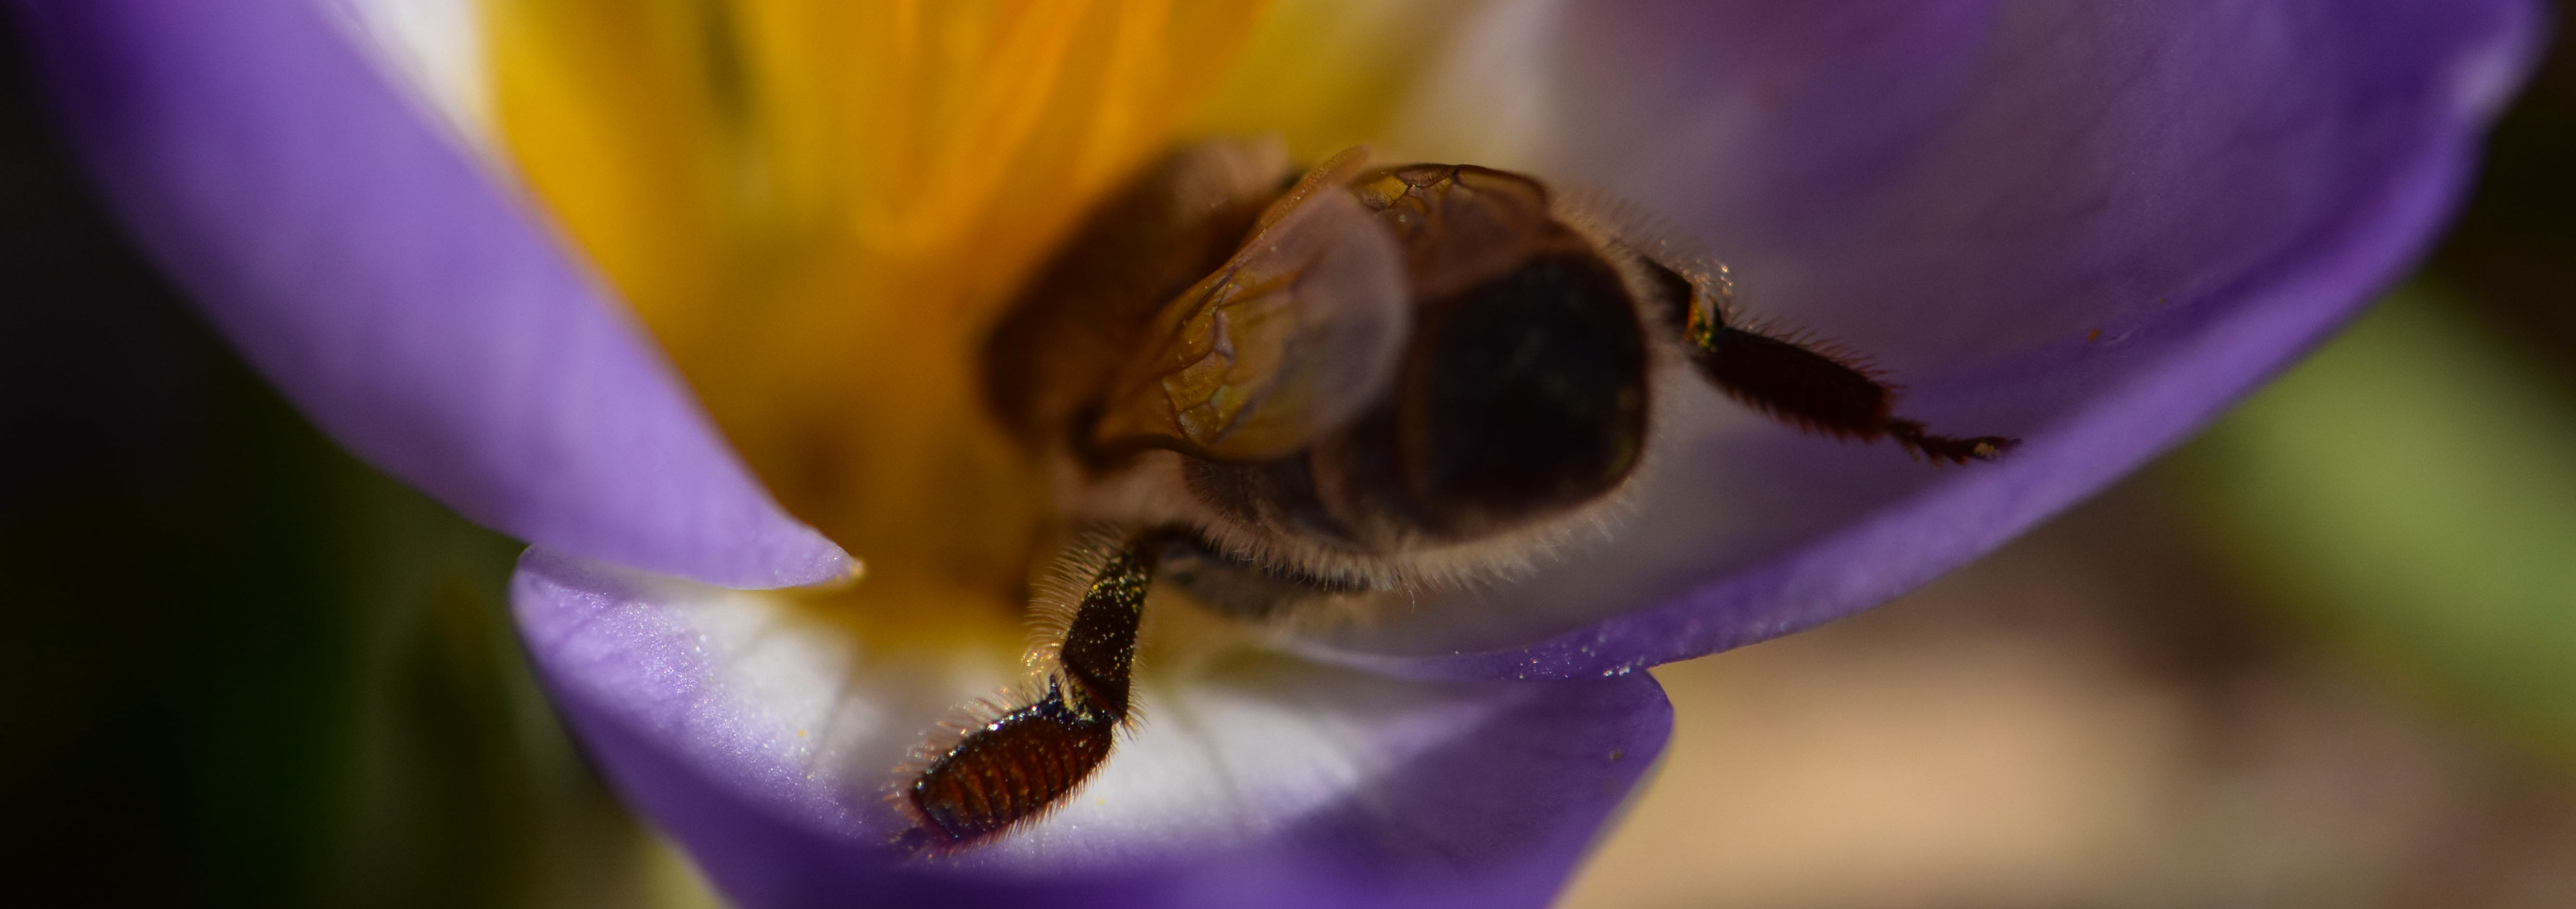 Nektar aus Krokus als Bienenfutter